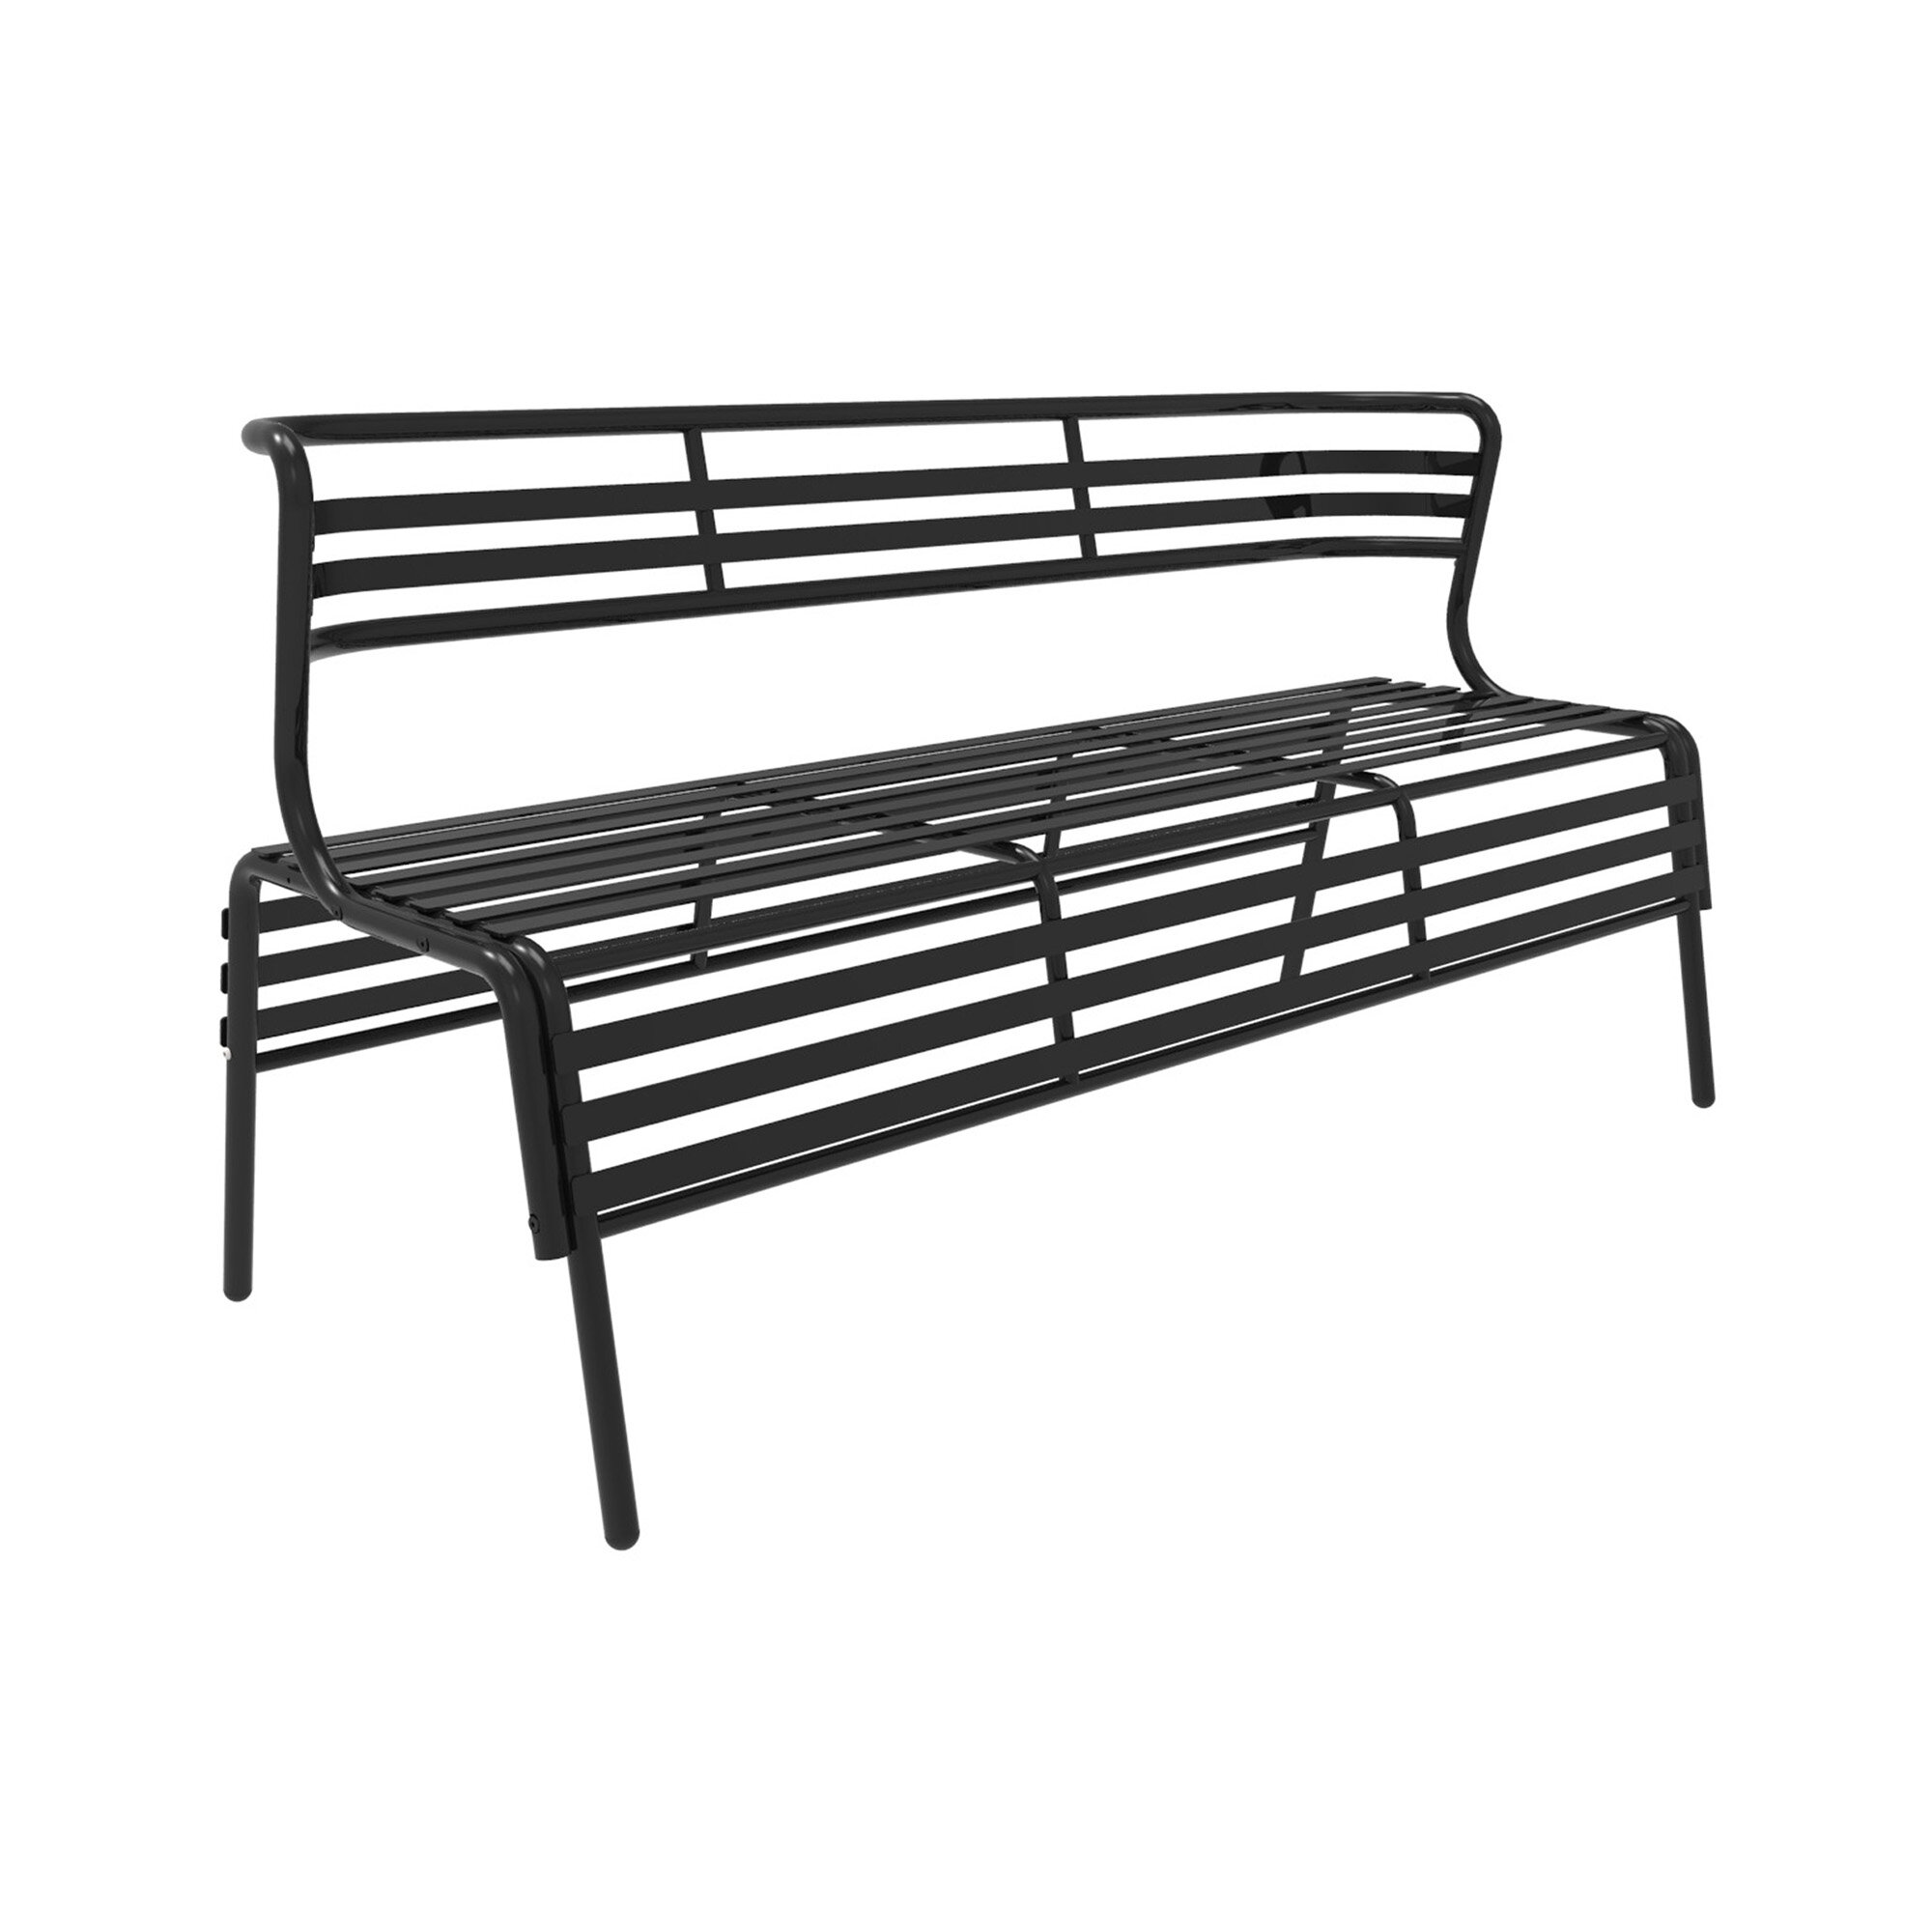 Swell Dasilva Steel Garden Bench Andrewgaddart Wooden Chair Designs For Living Room Andrewgaddartcom